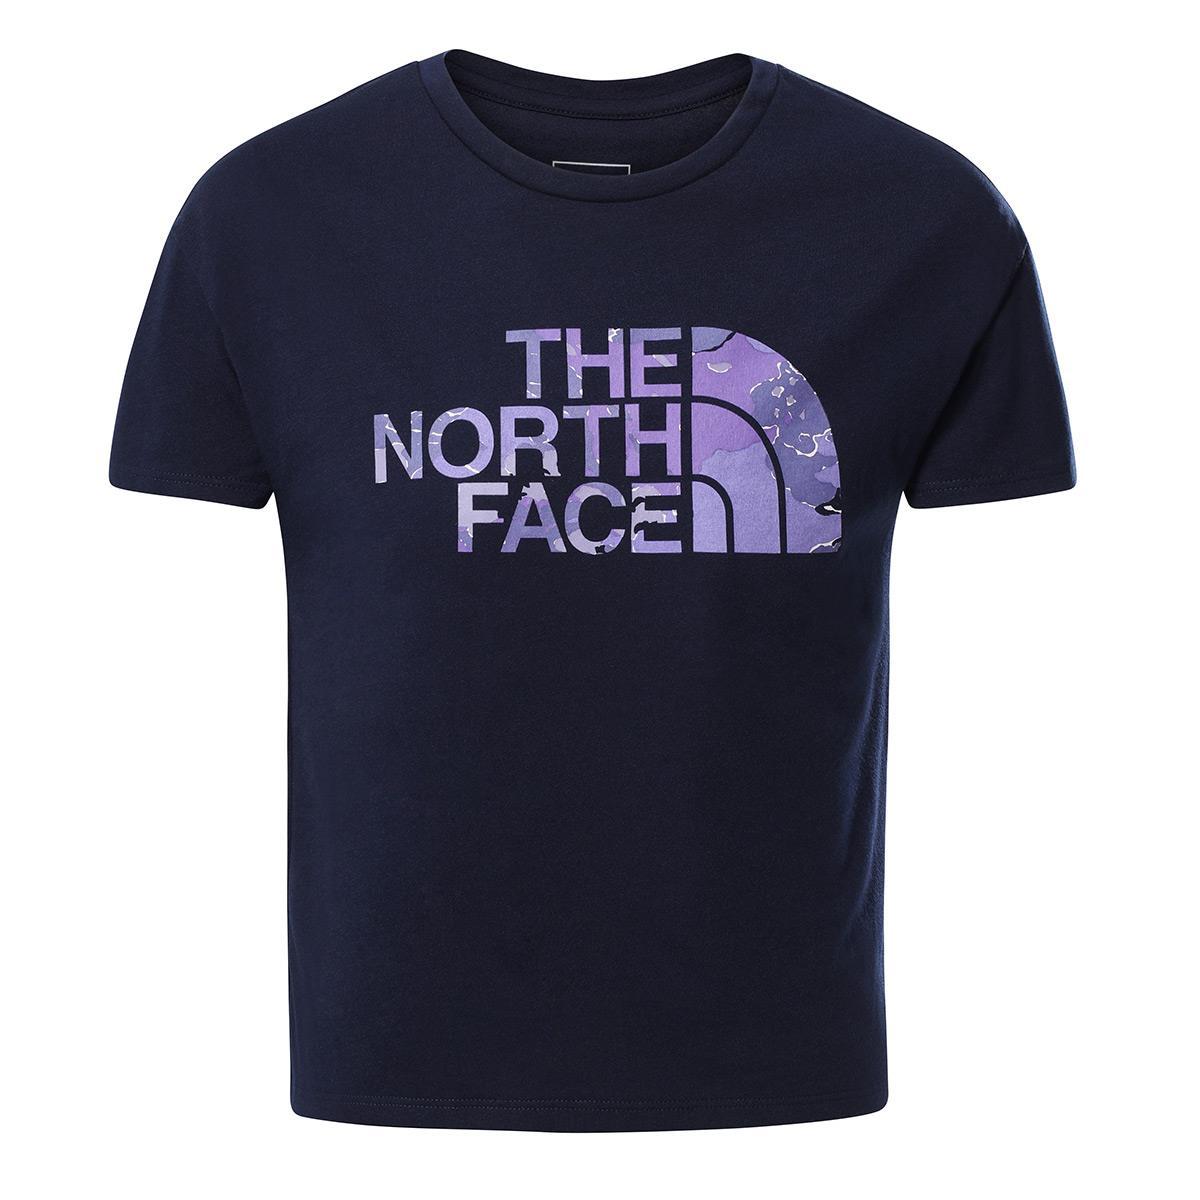 The North Face  Kız Çocuk  S/S ON MOUNTAIN Tişört